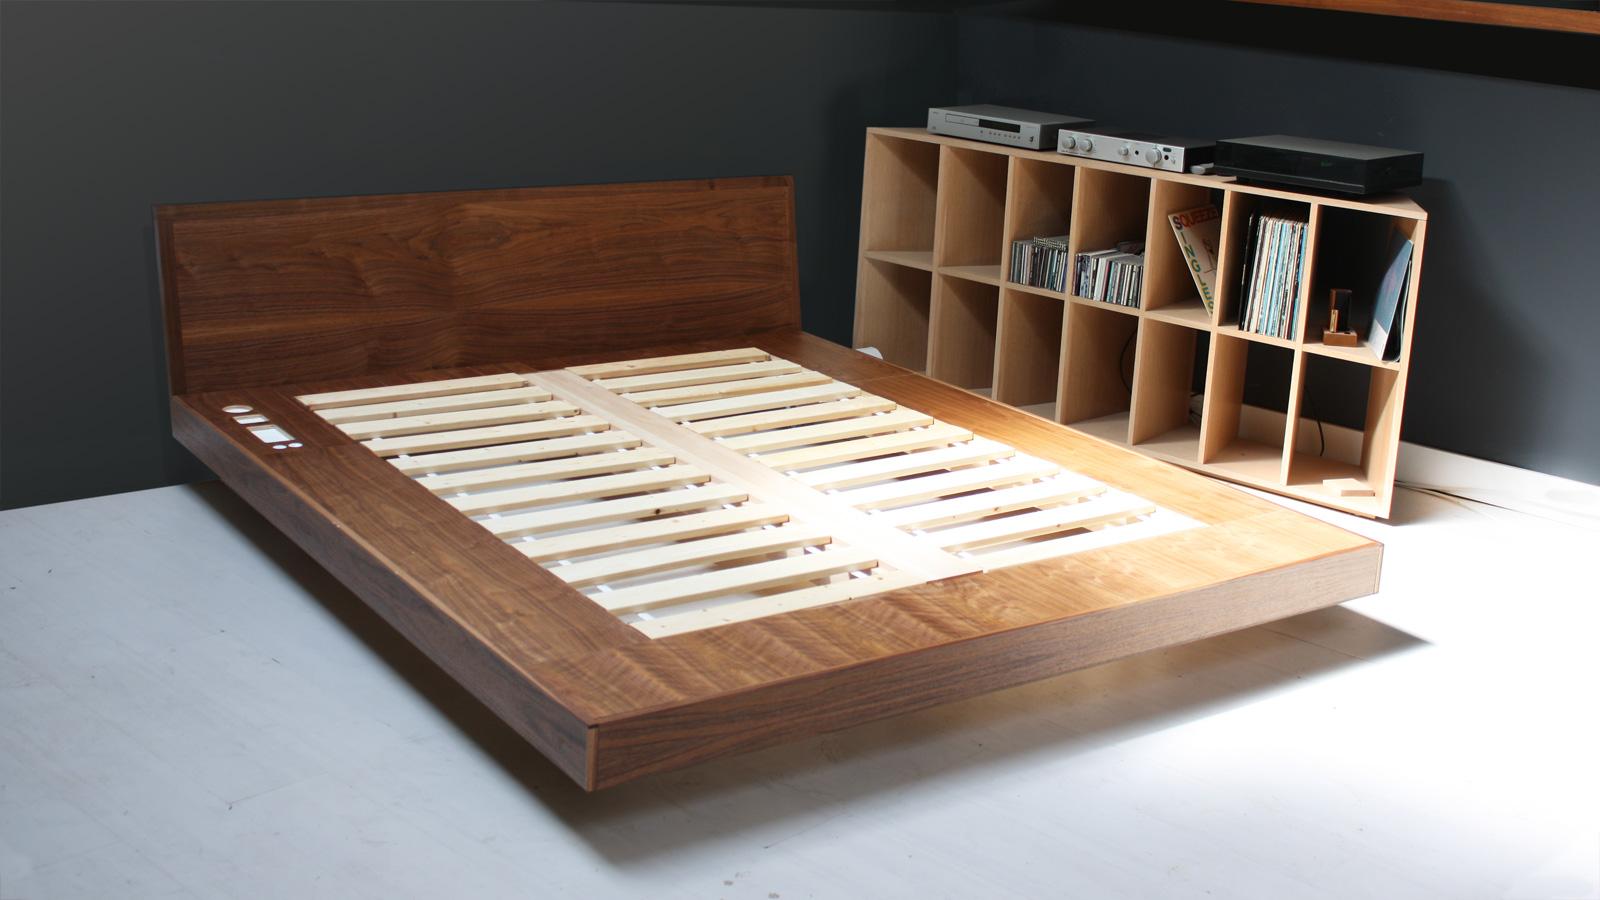 Best  Diy Platform Bed Ideas On Pinterest Diy Platform Bed Frame - Easy platform bed ideas